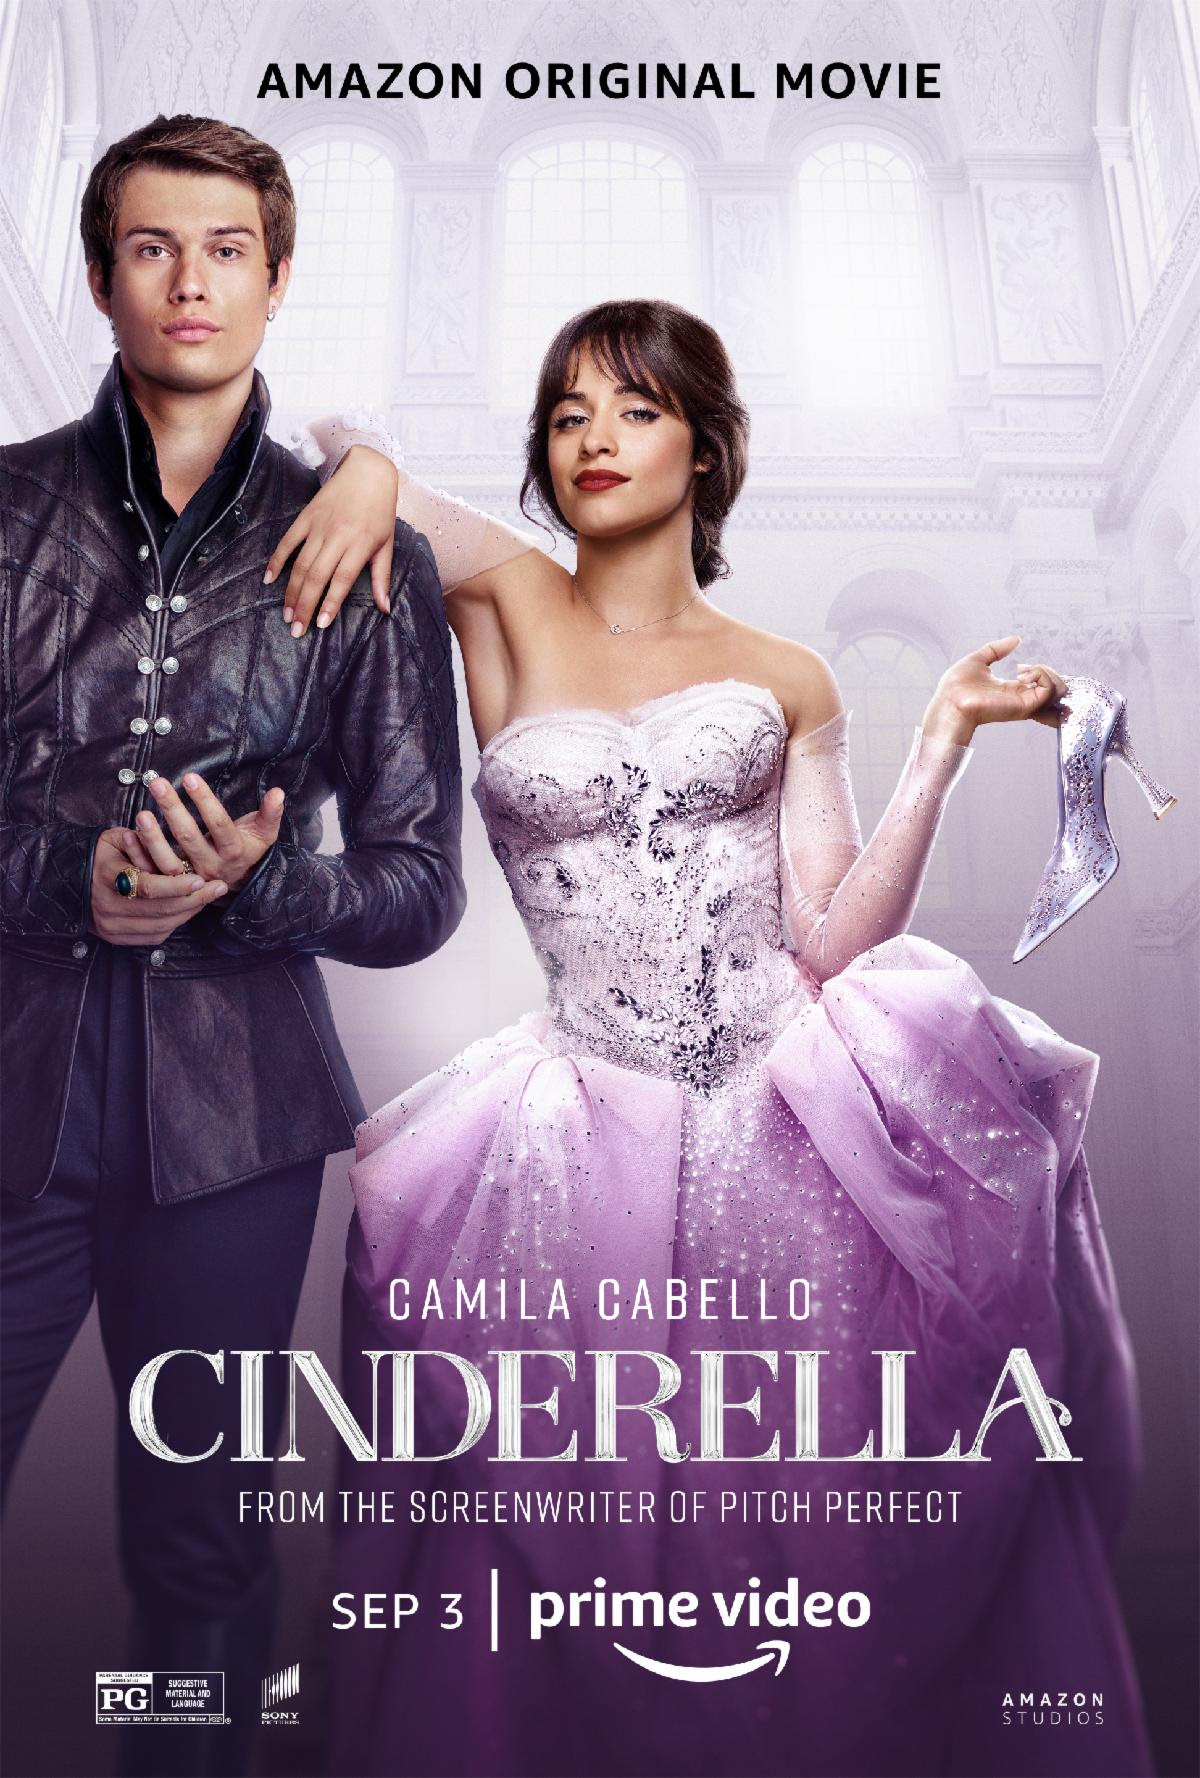 Amazon Studios' CINDERELLA